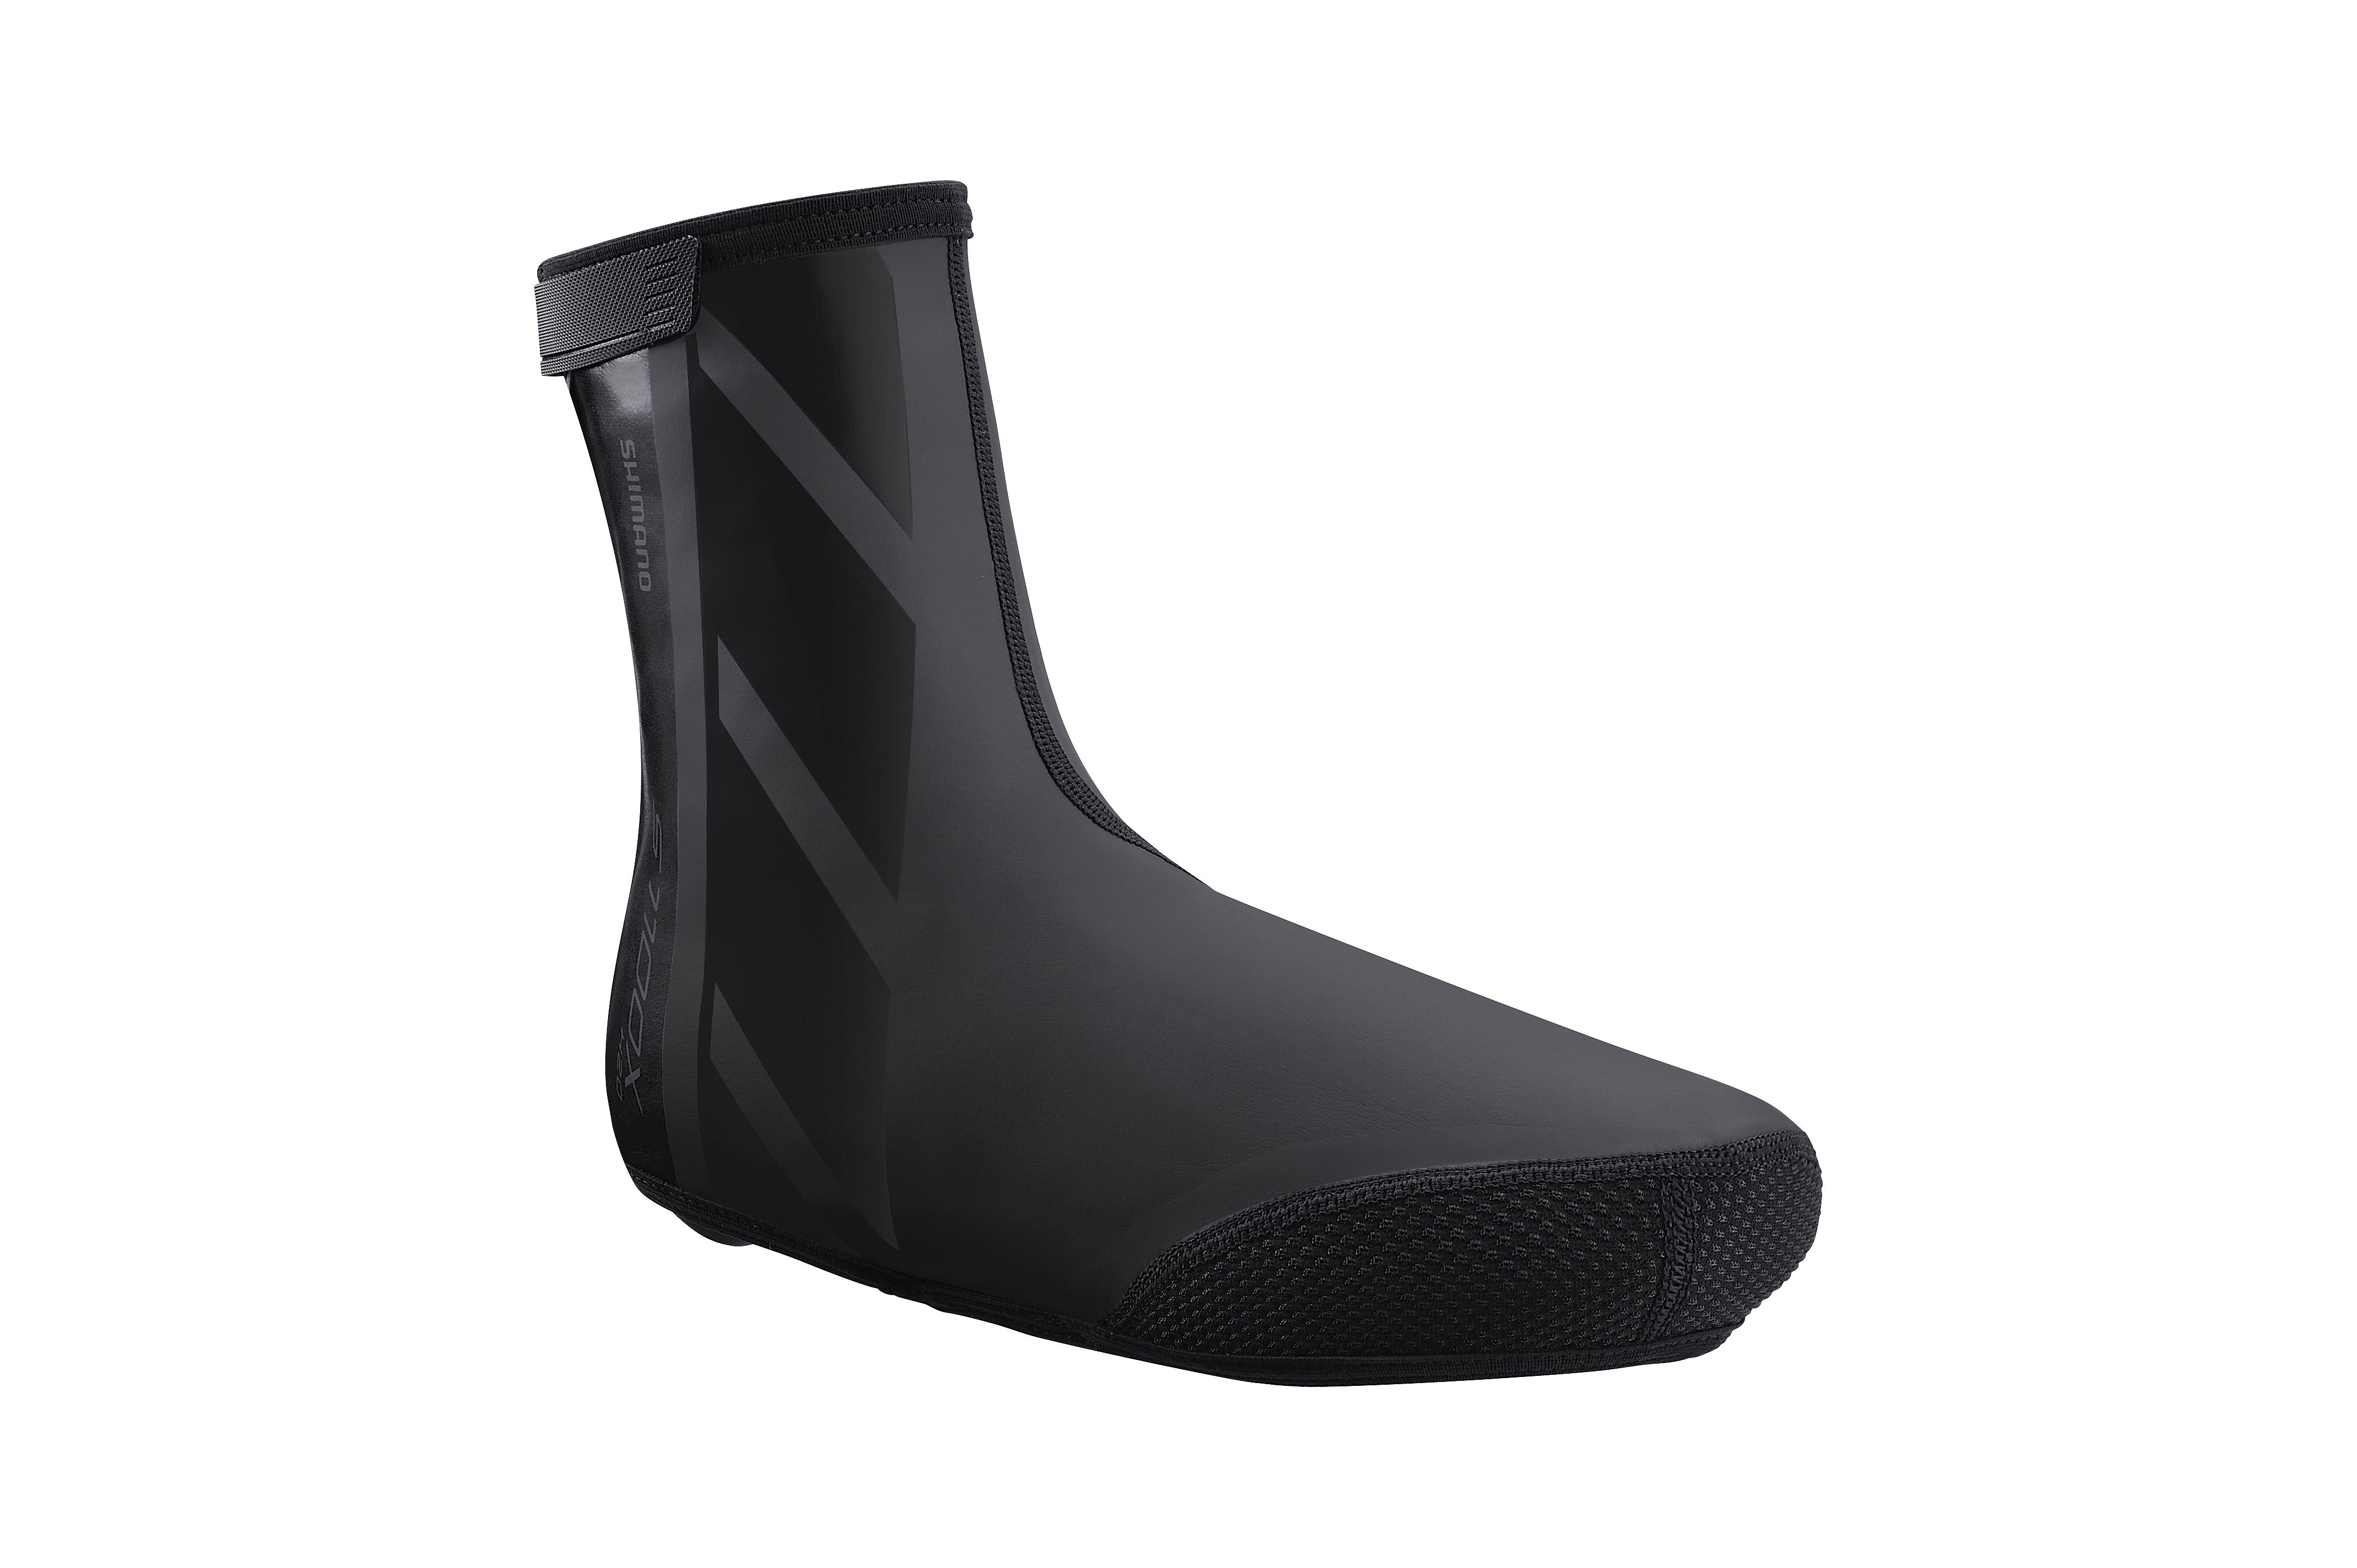 SHIMANO S1100X H2O návleky na obuv, černá, S